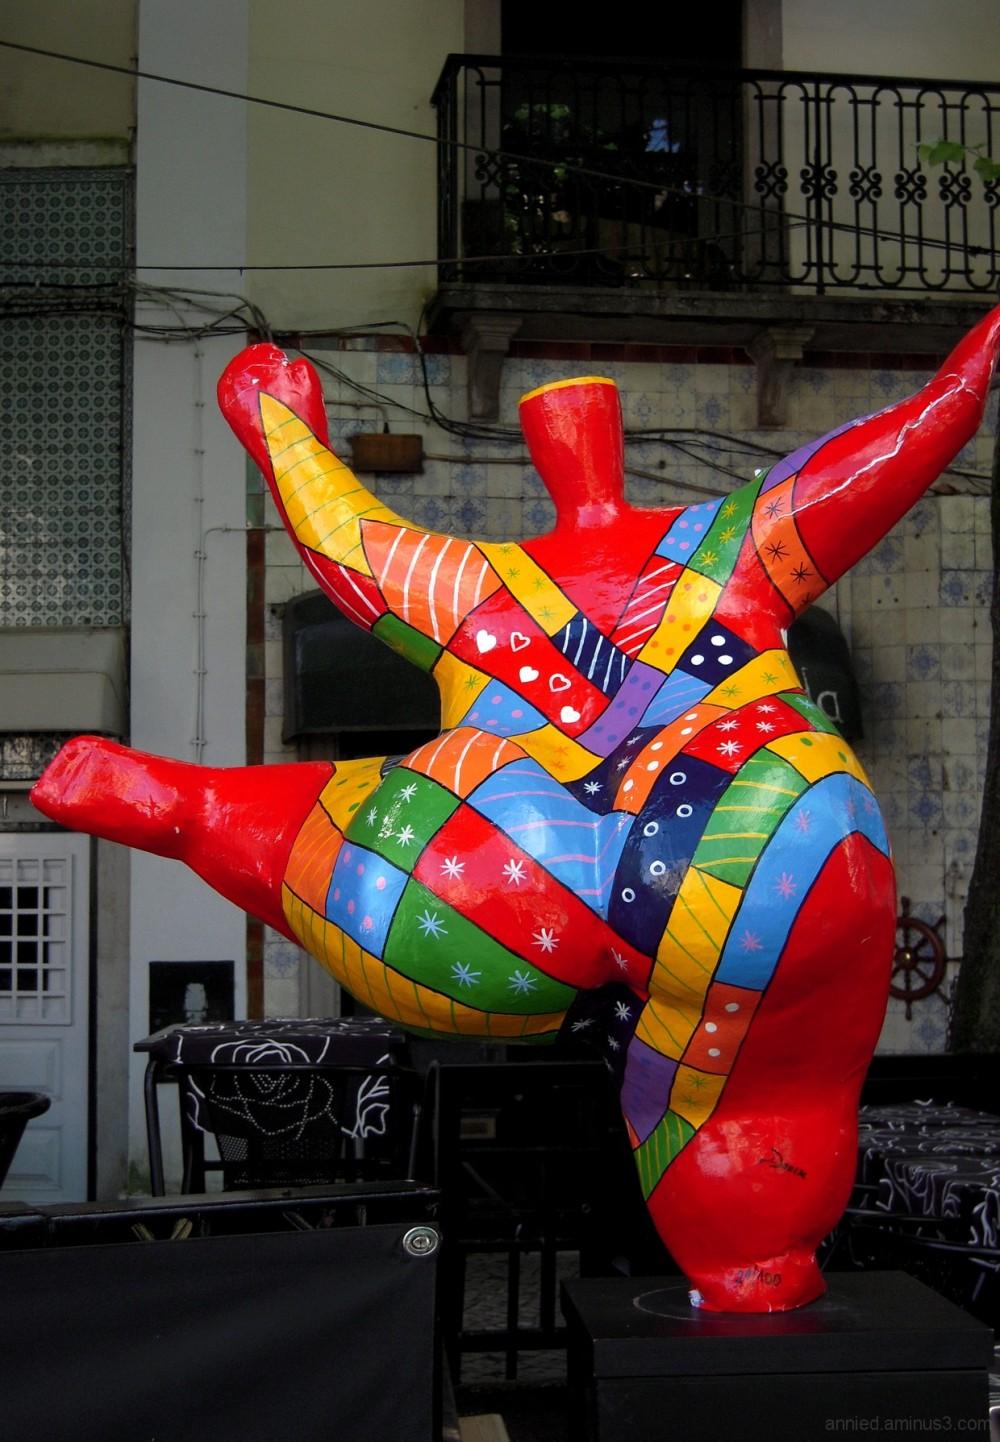 L'art dans la rue - 9